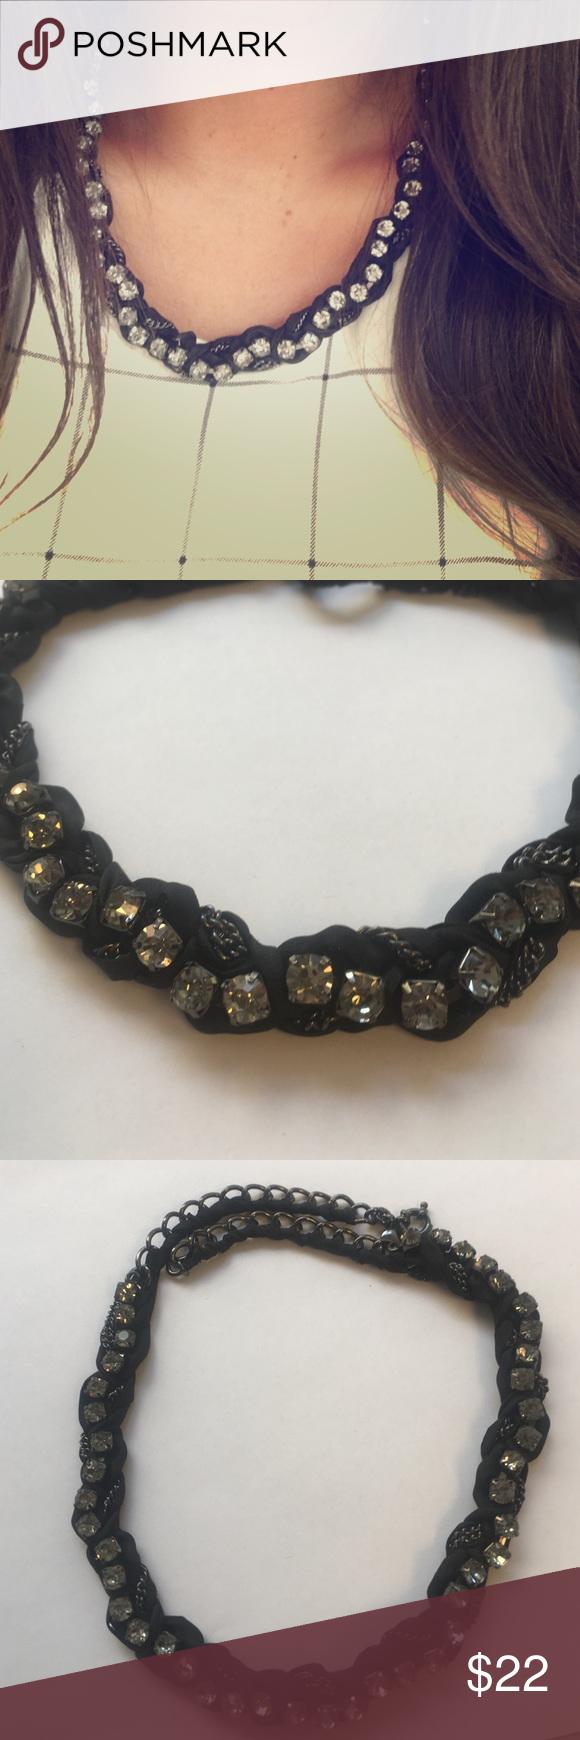 J.crew Gemstone Necklace J. Crew black satin and gem stone necklace. Dress it up or dress it down! Like new condition. J. Crew Jewelry Necklaces